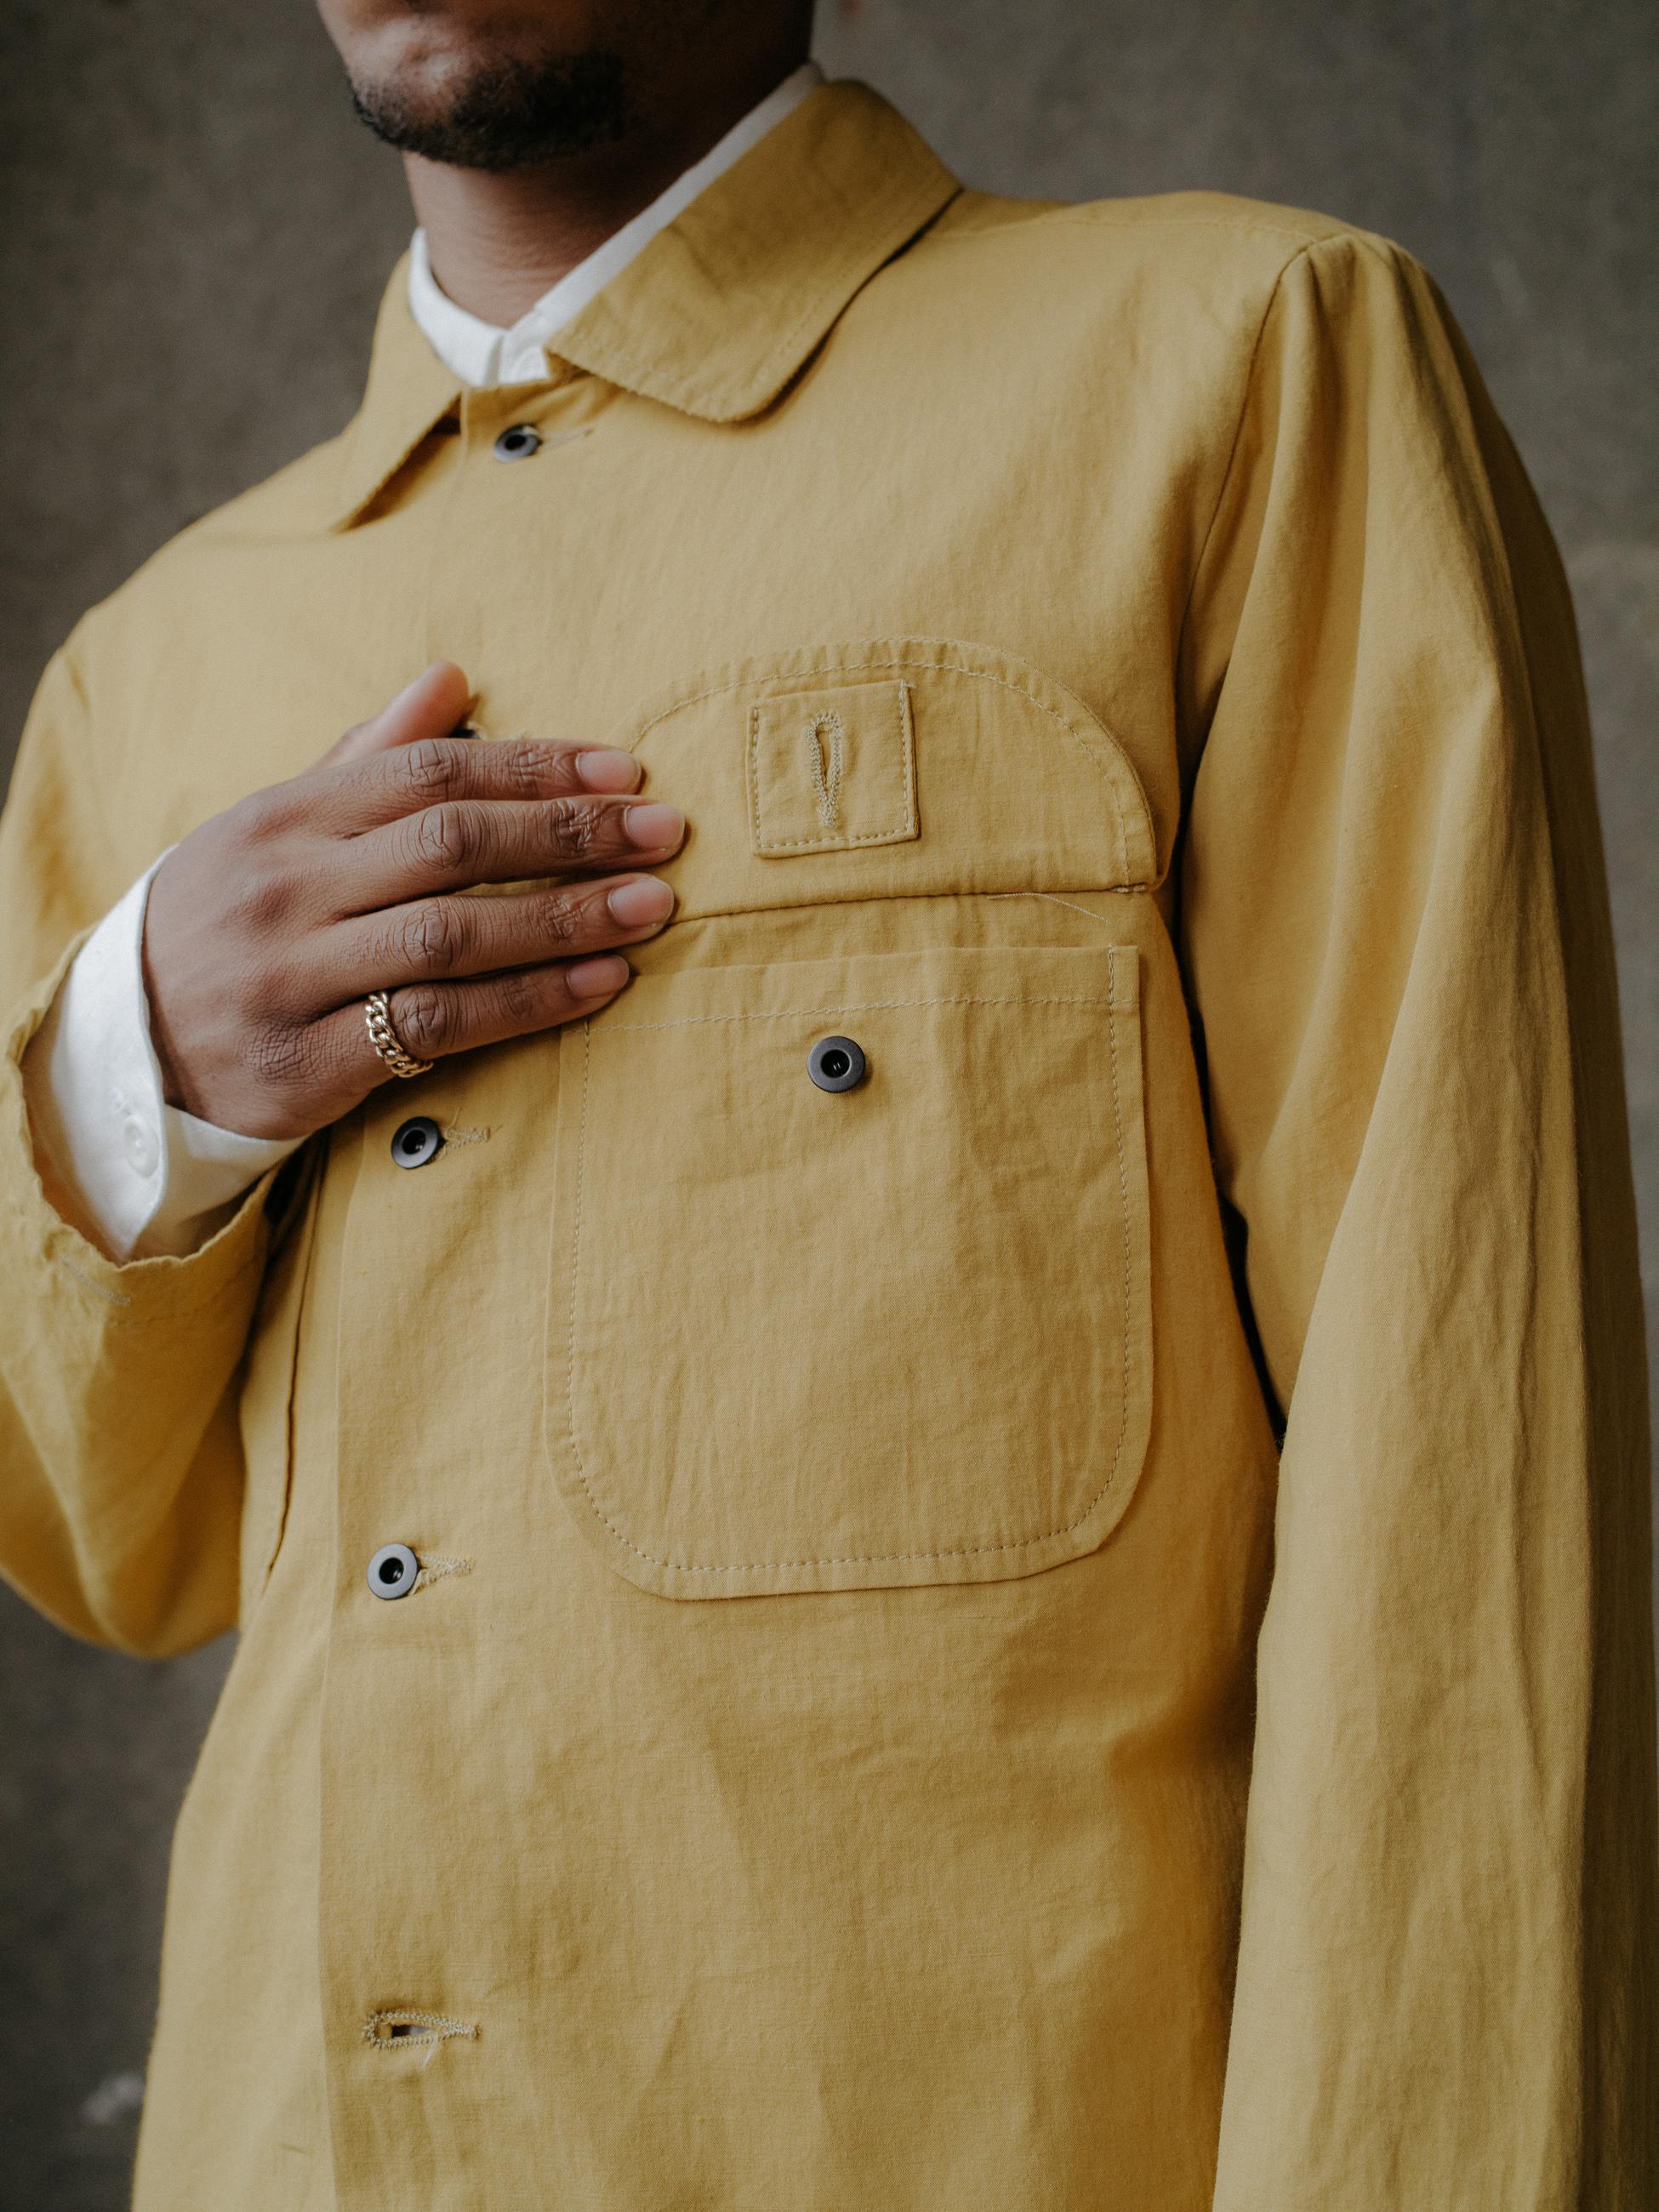 evan-kinori-field-shirt-cotton-hemp-typewriter-cloth-japan-4